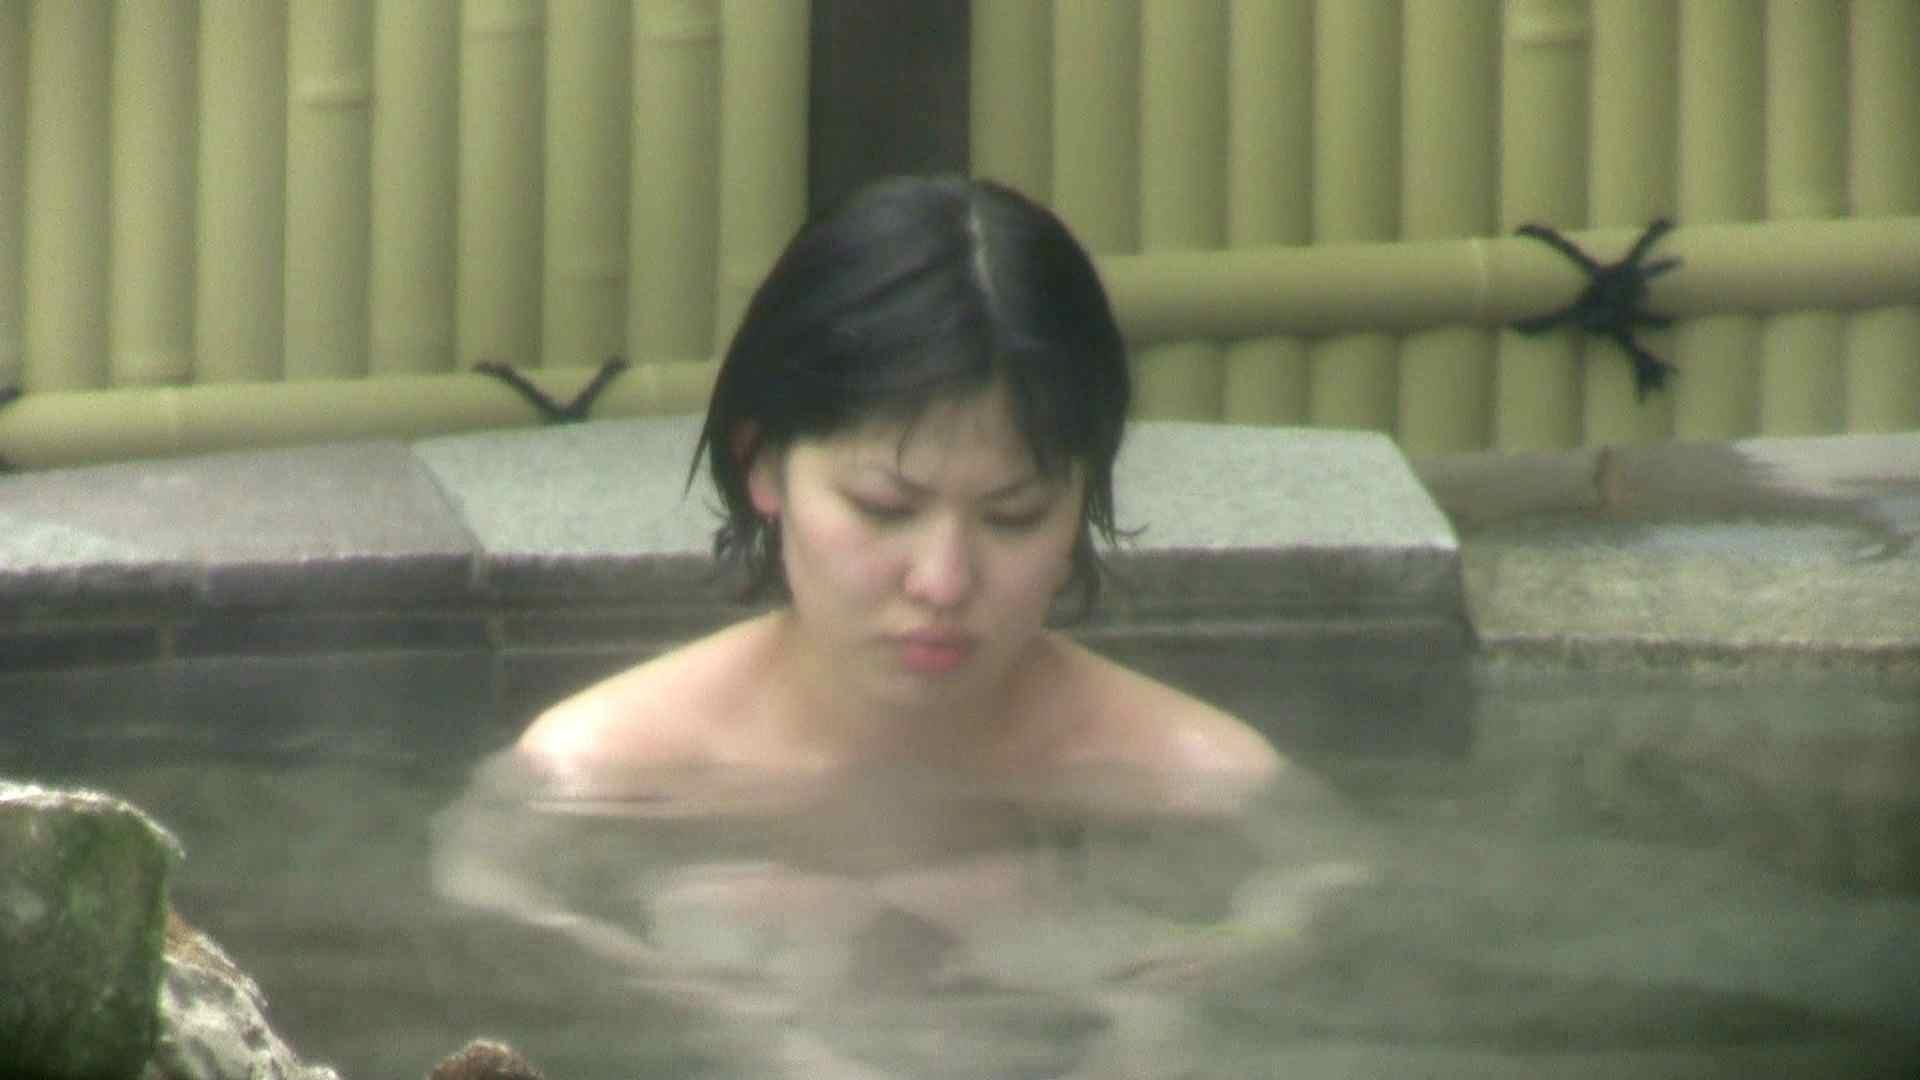 Aquaな露天風呂Vol.114 盗撮映像  72Pix 11